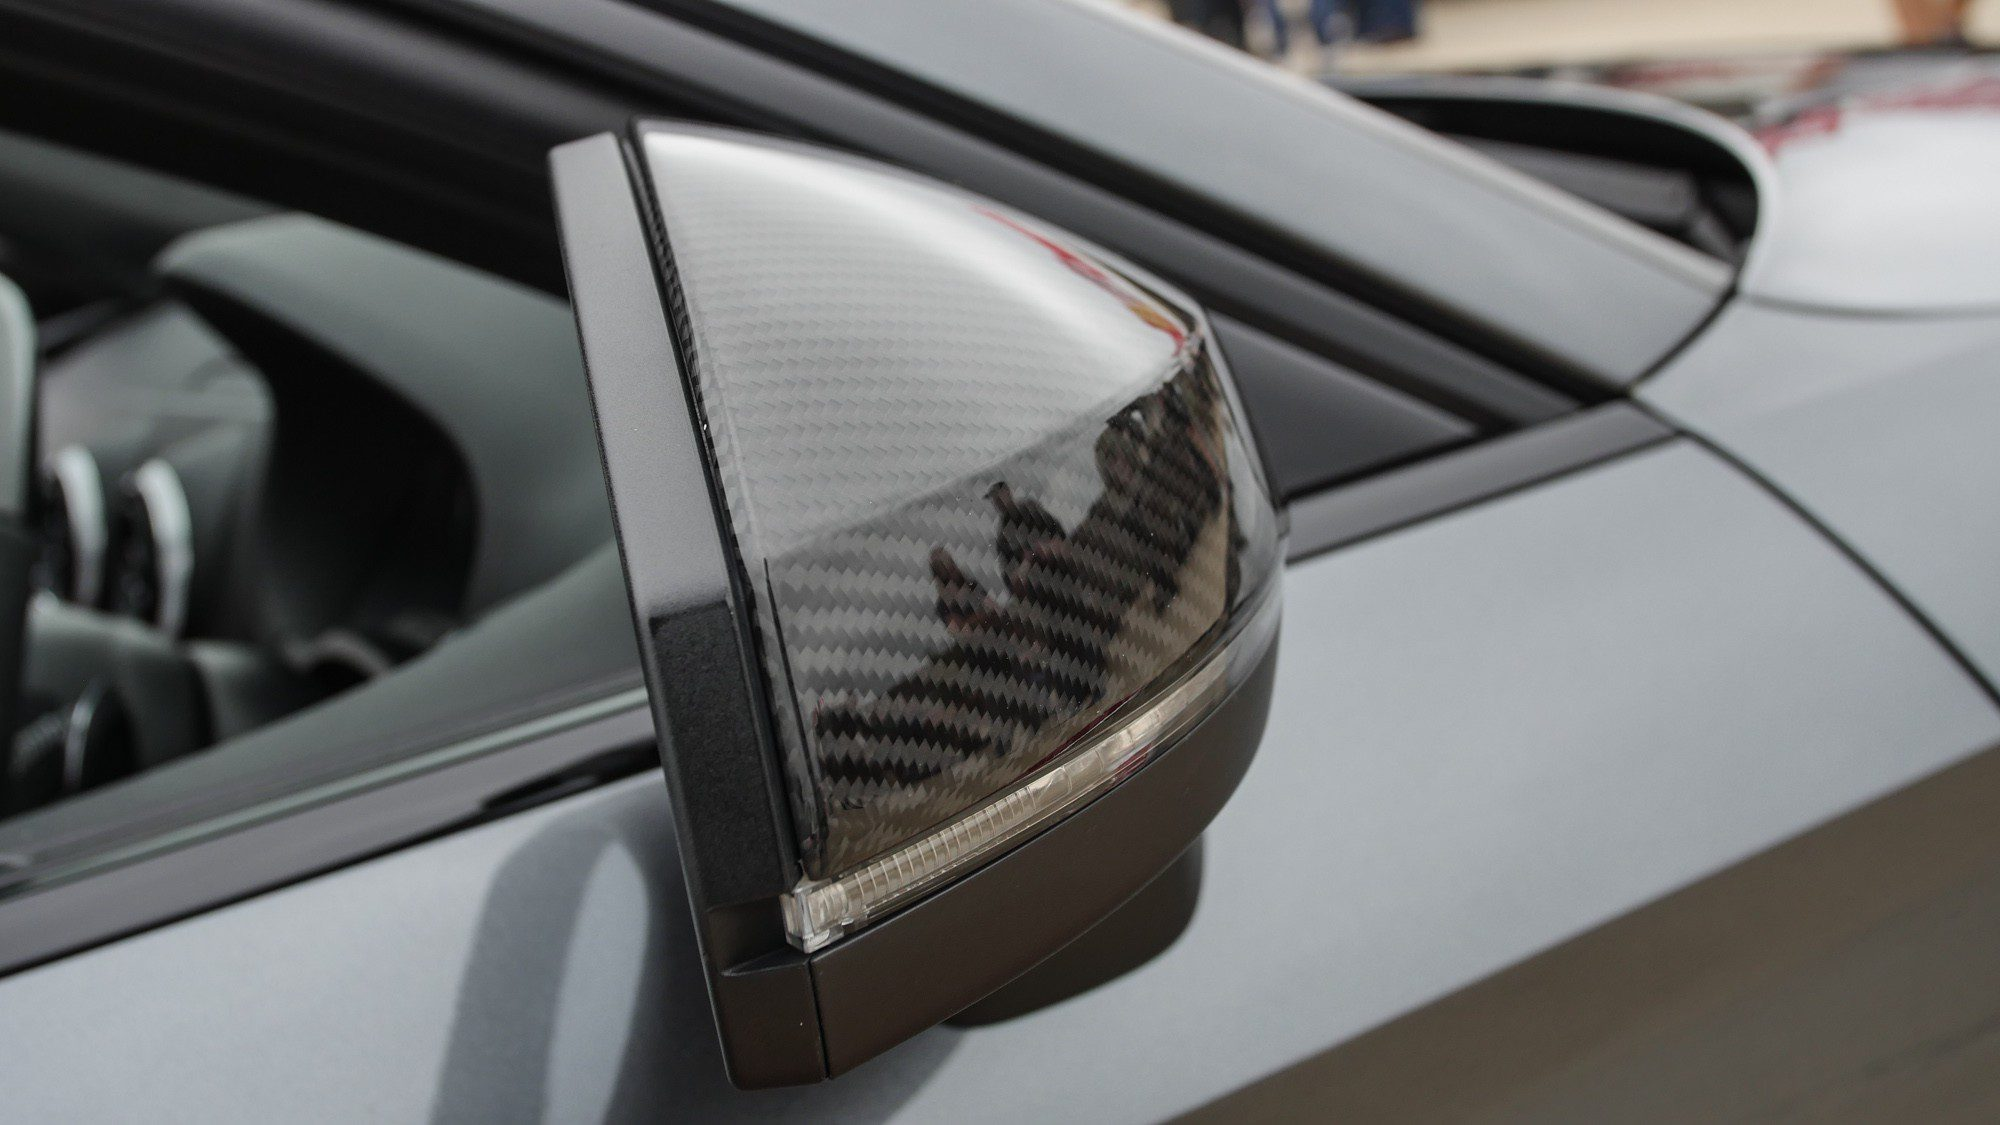 Seitenspiegel aus Carbon an der Audi S3 Limousine